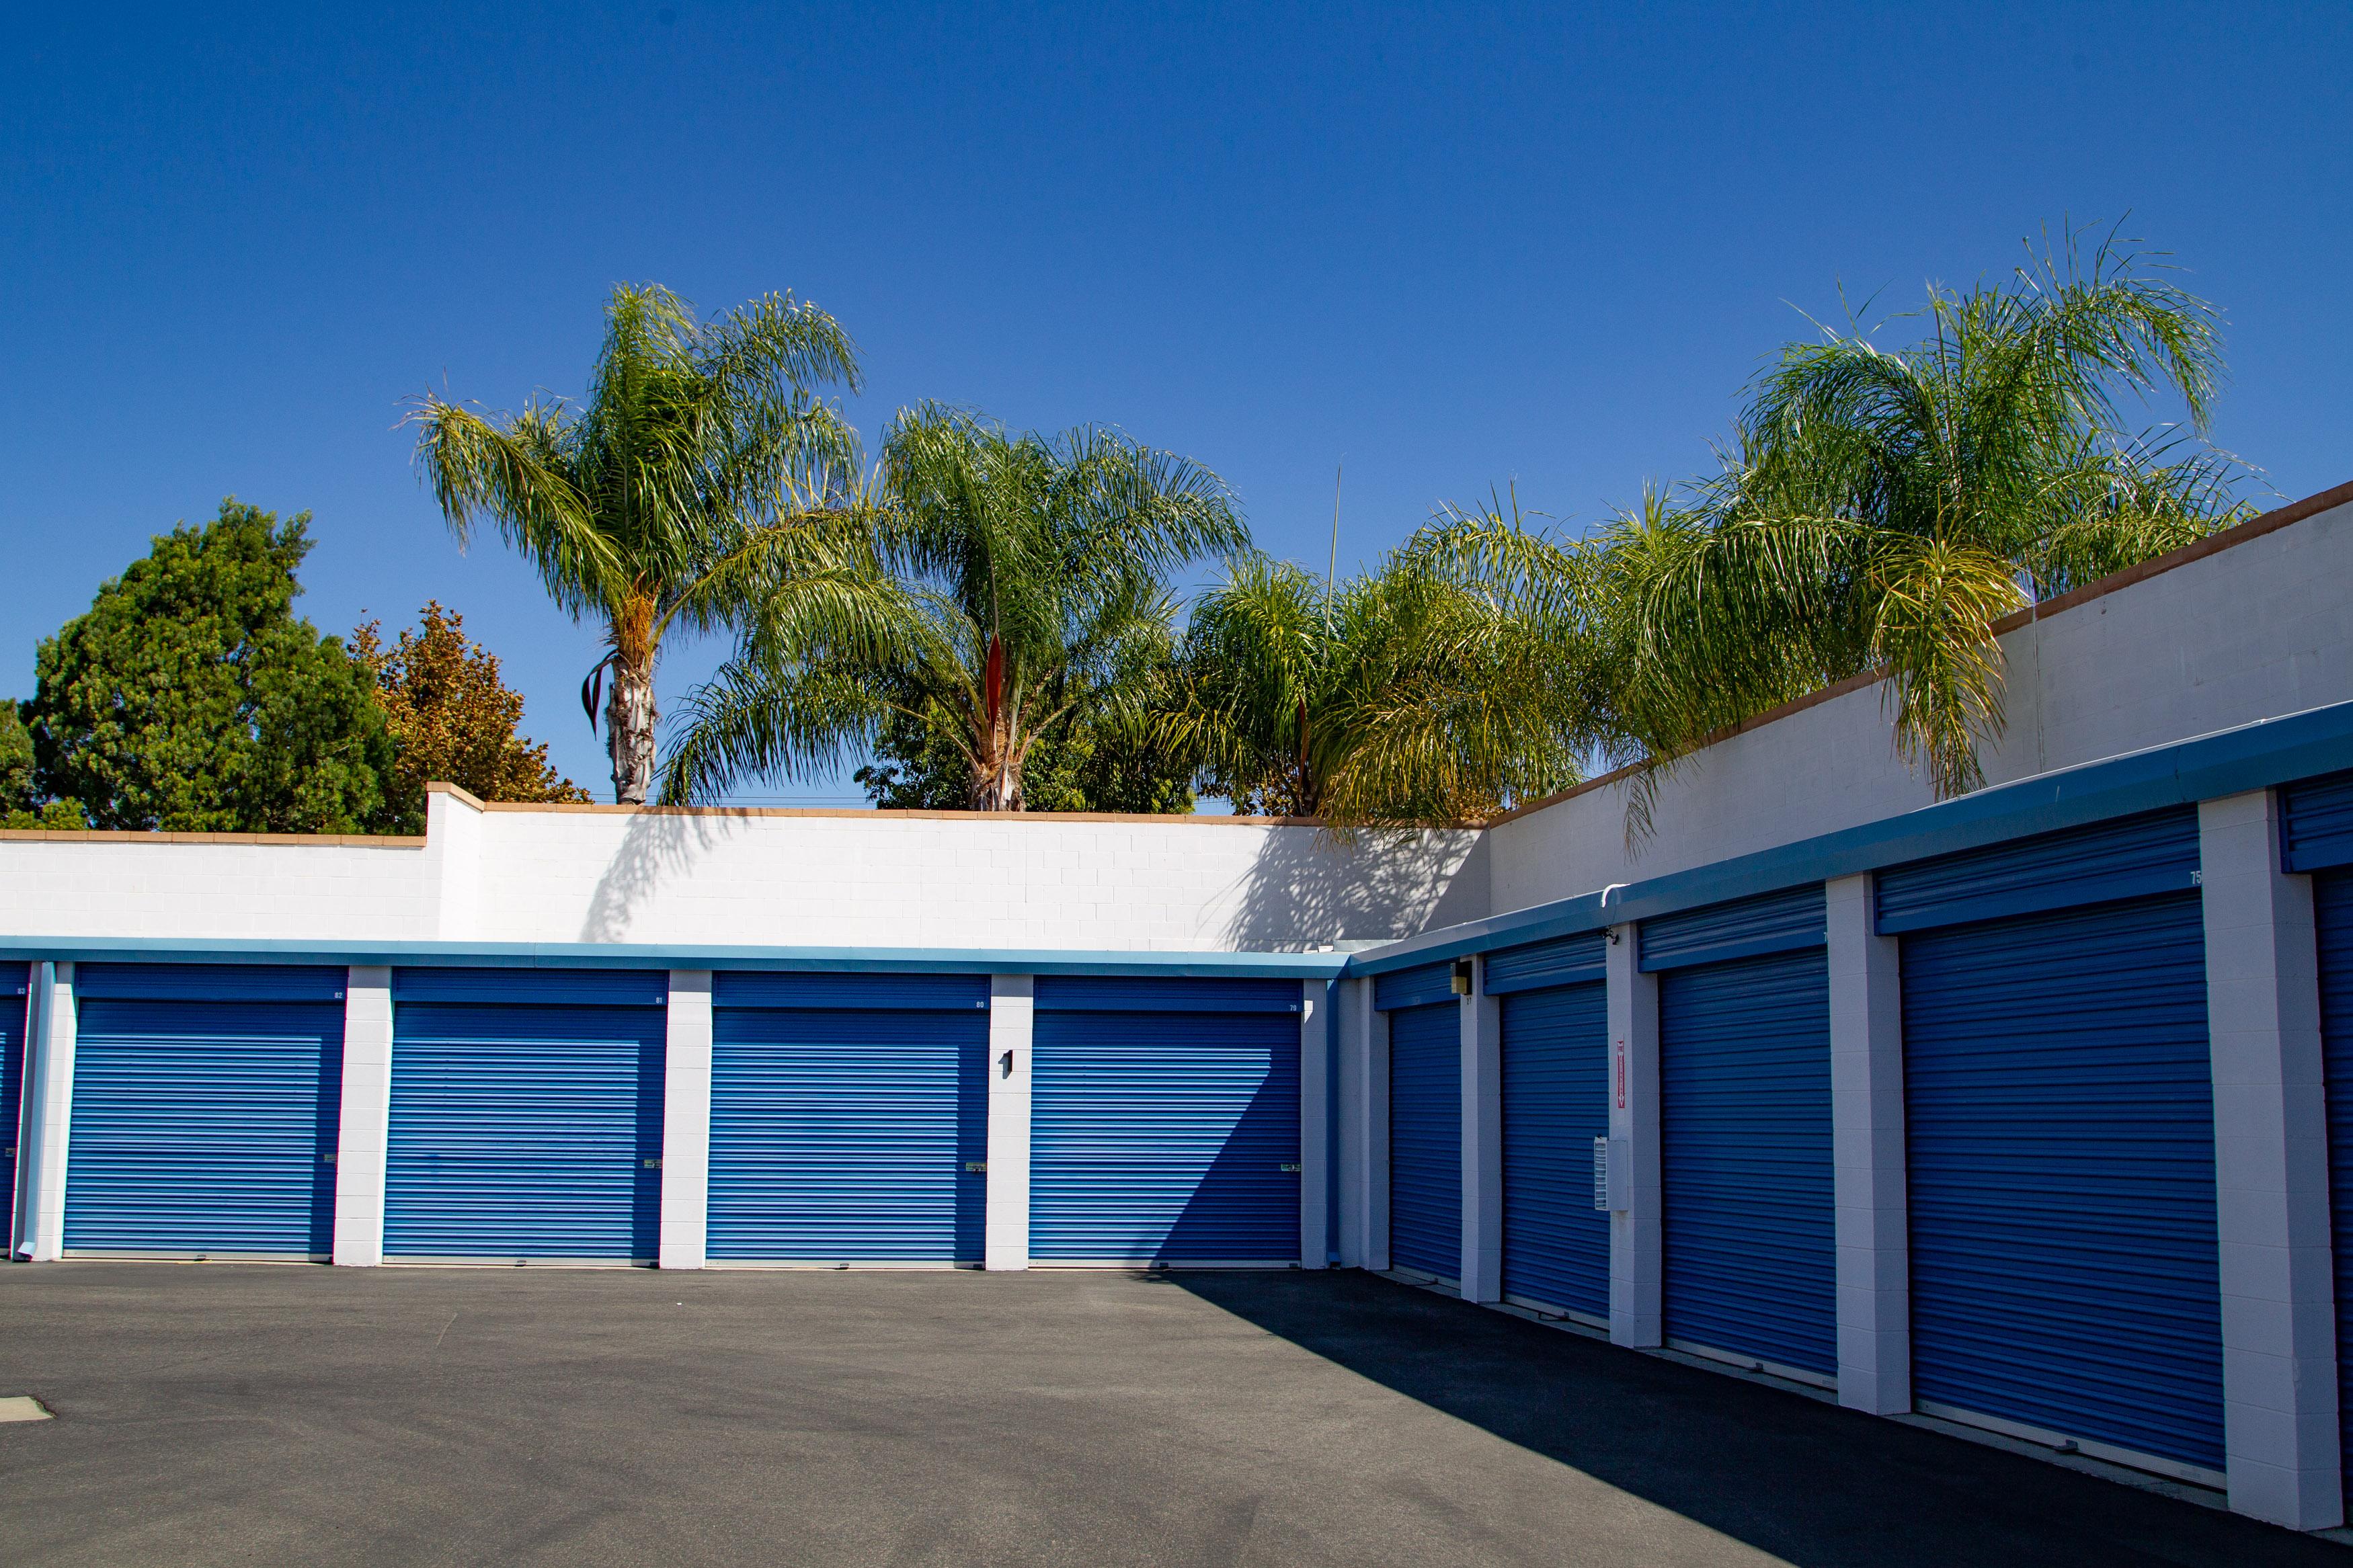 Storage in Temecula, CA